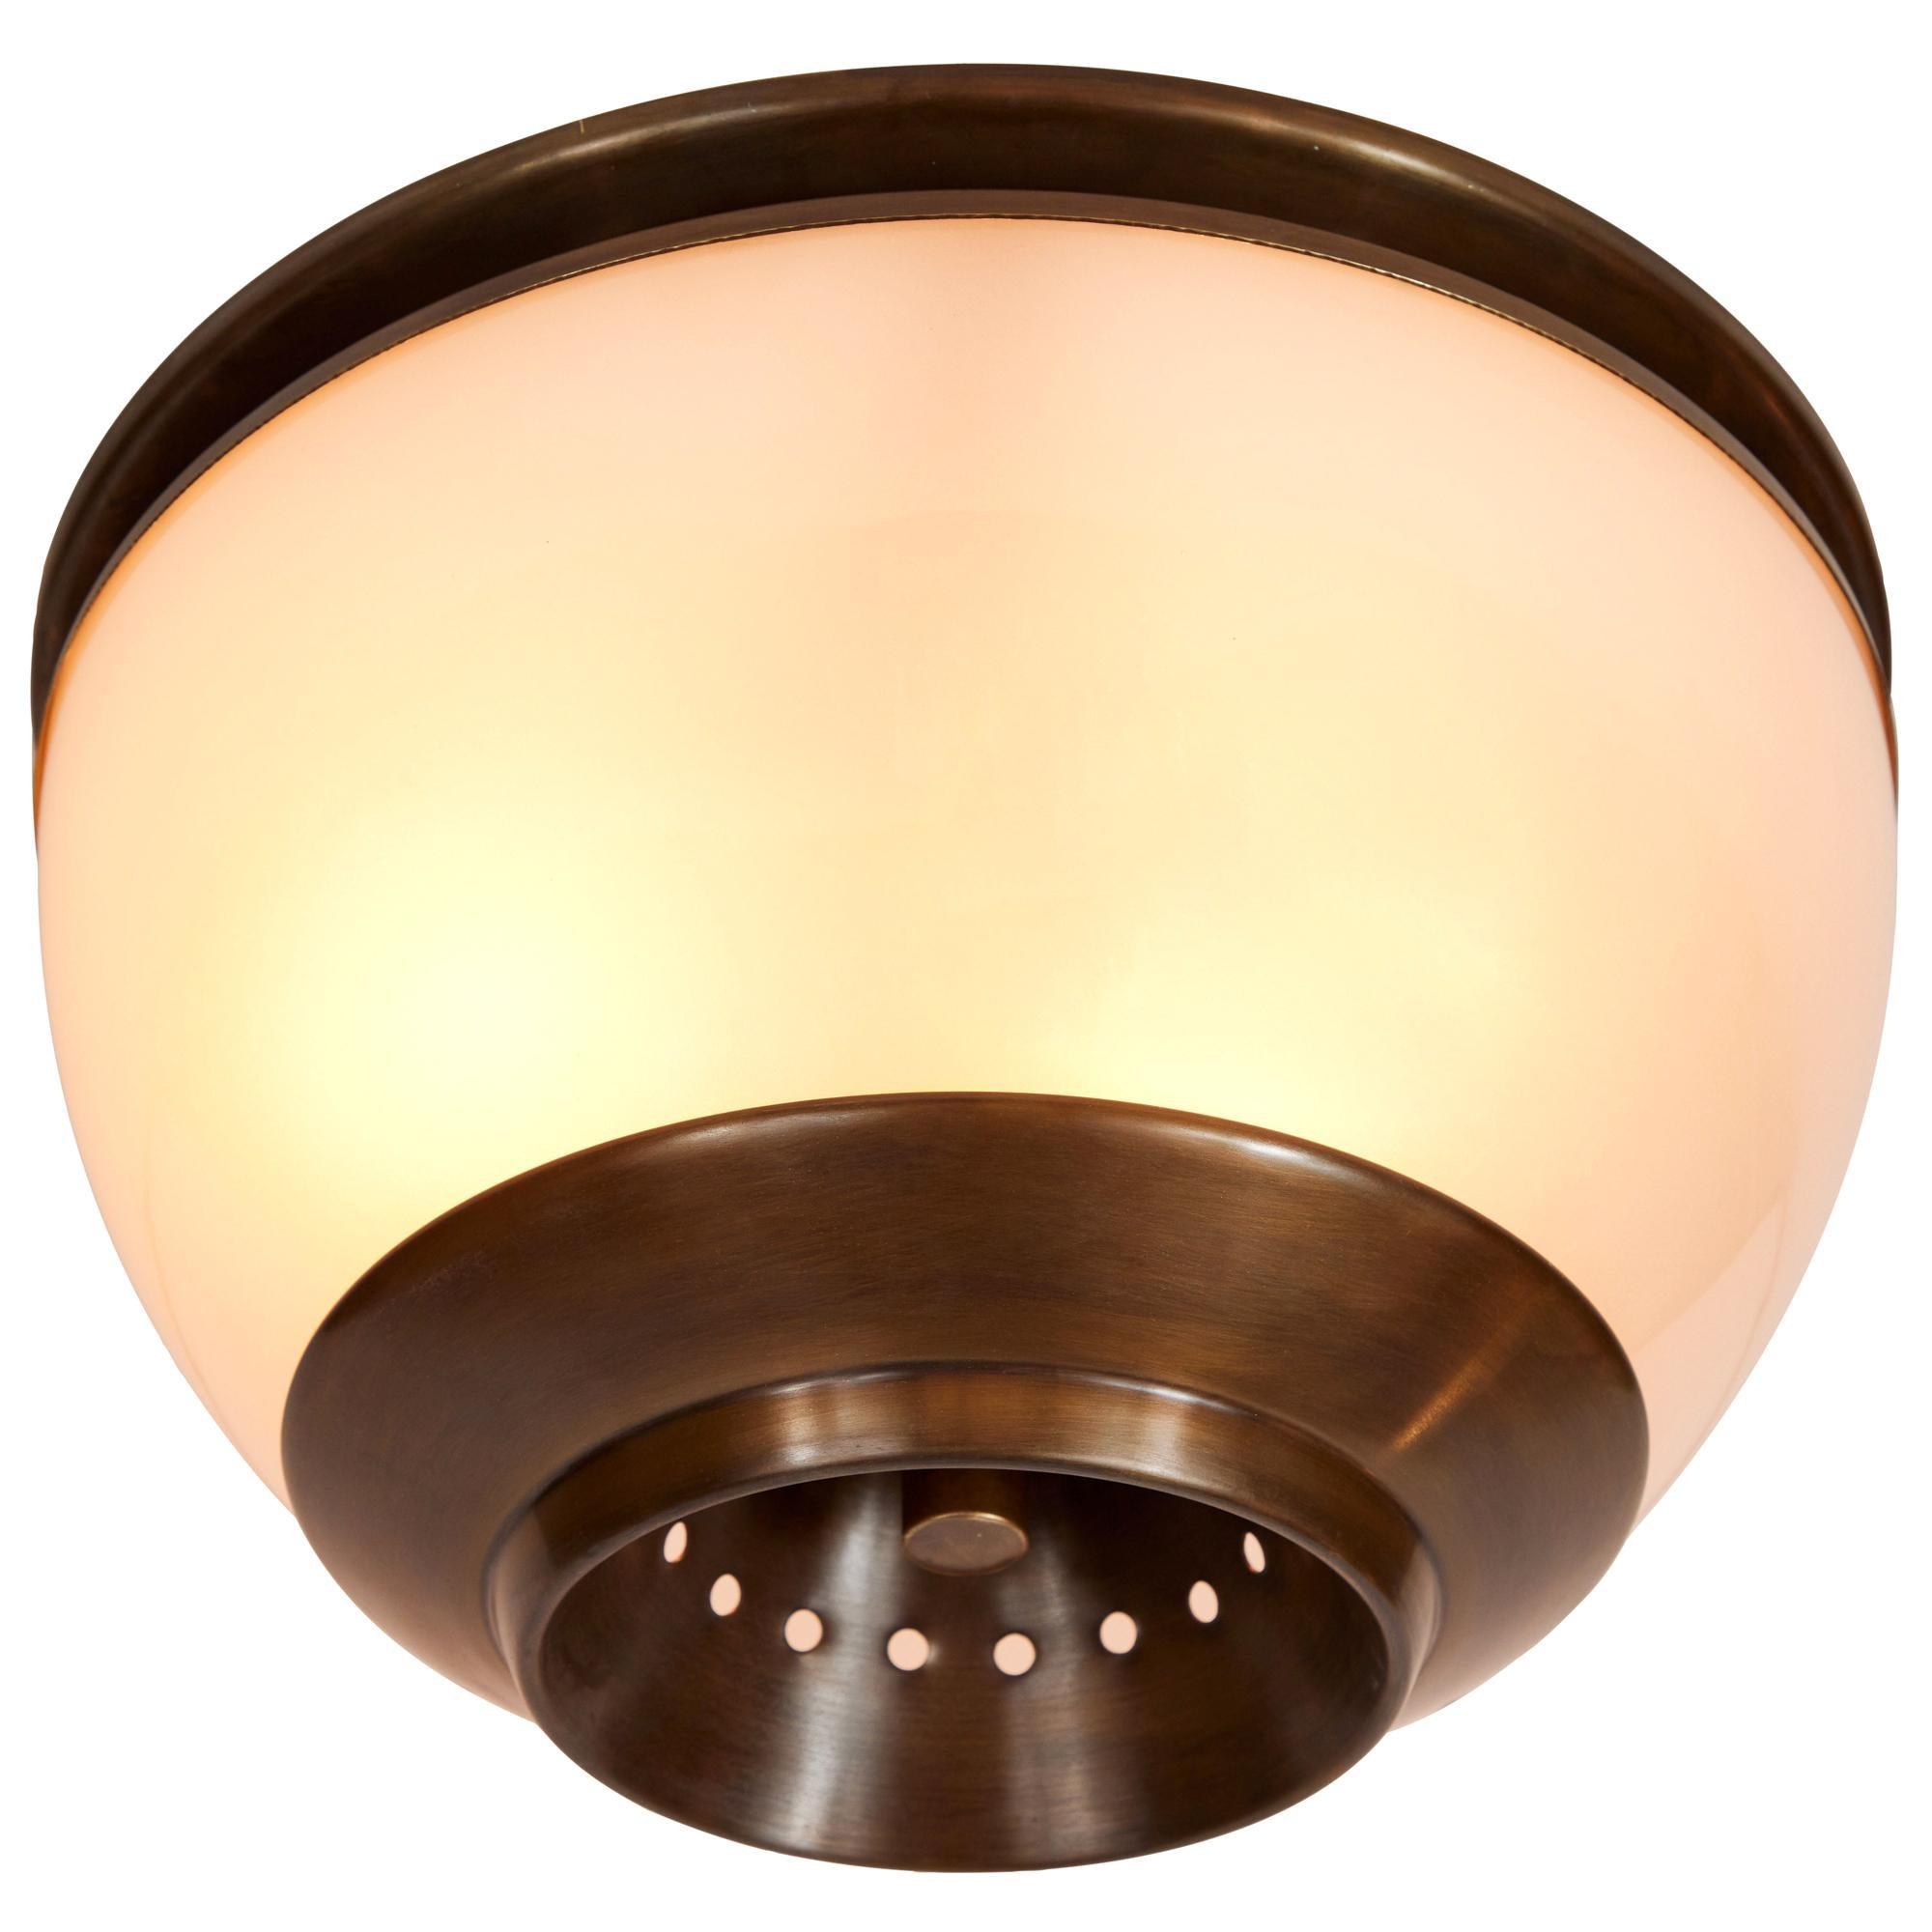 1960s Luigi Caccia Dominioni LSP3 Ceiling or Wall Light for Azucena